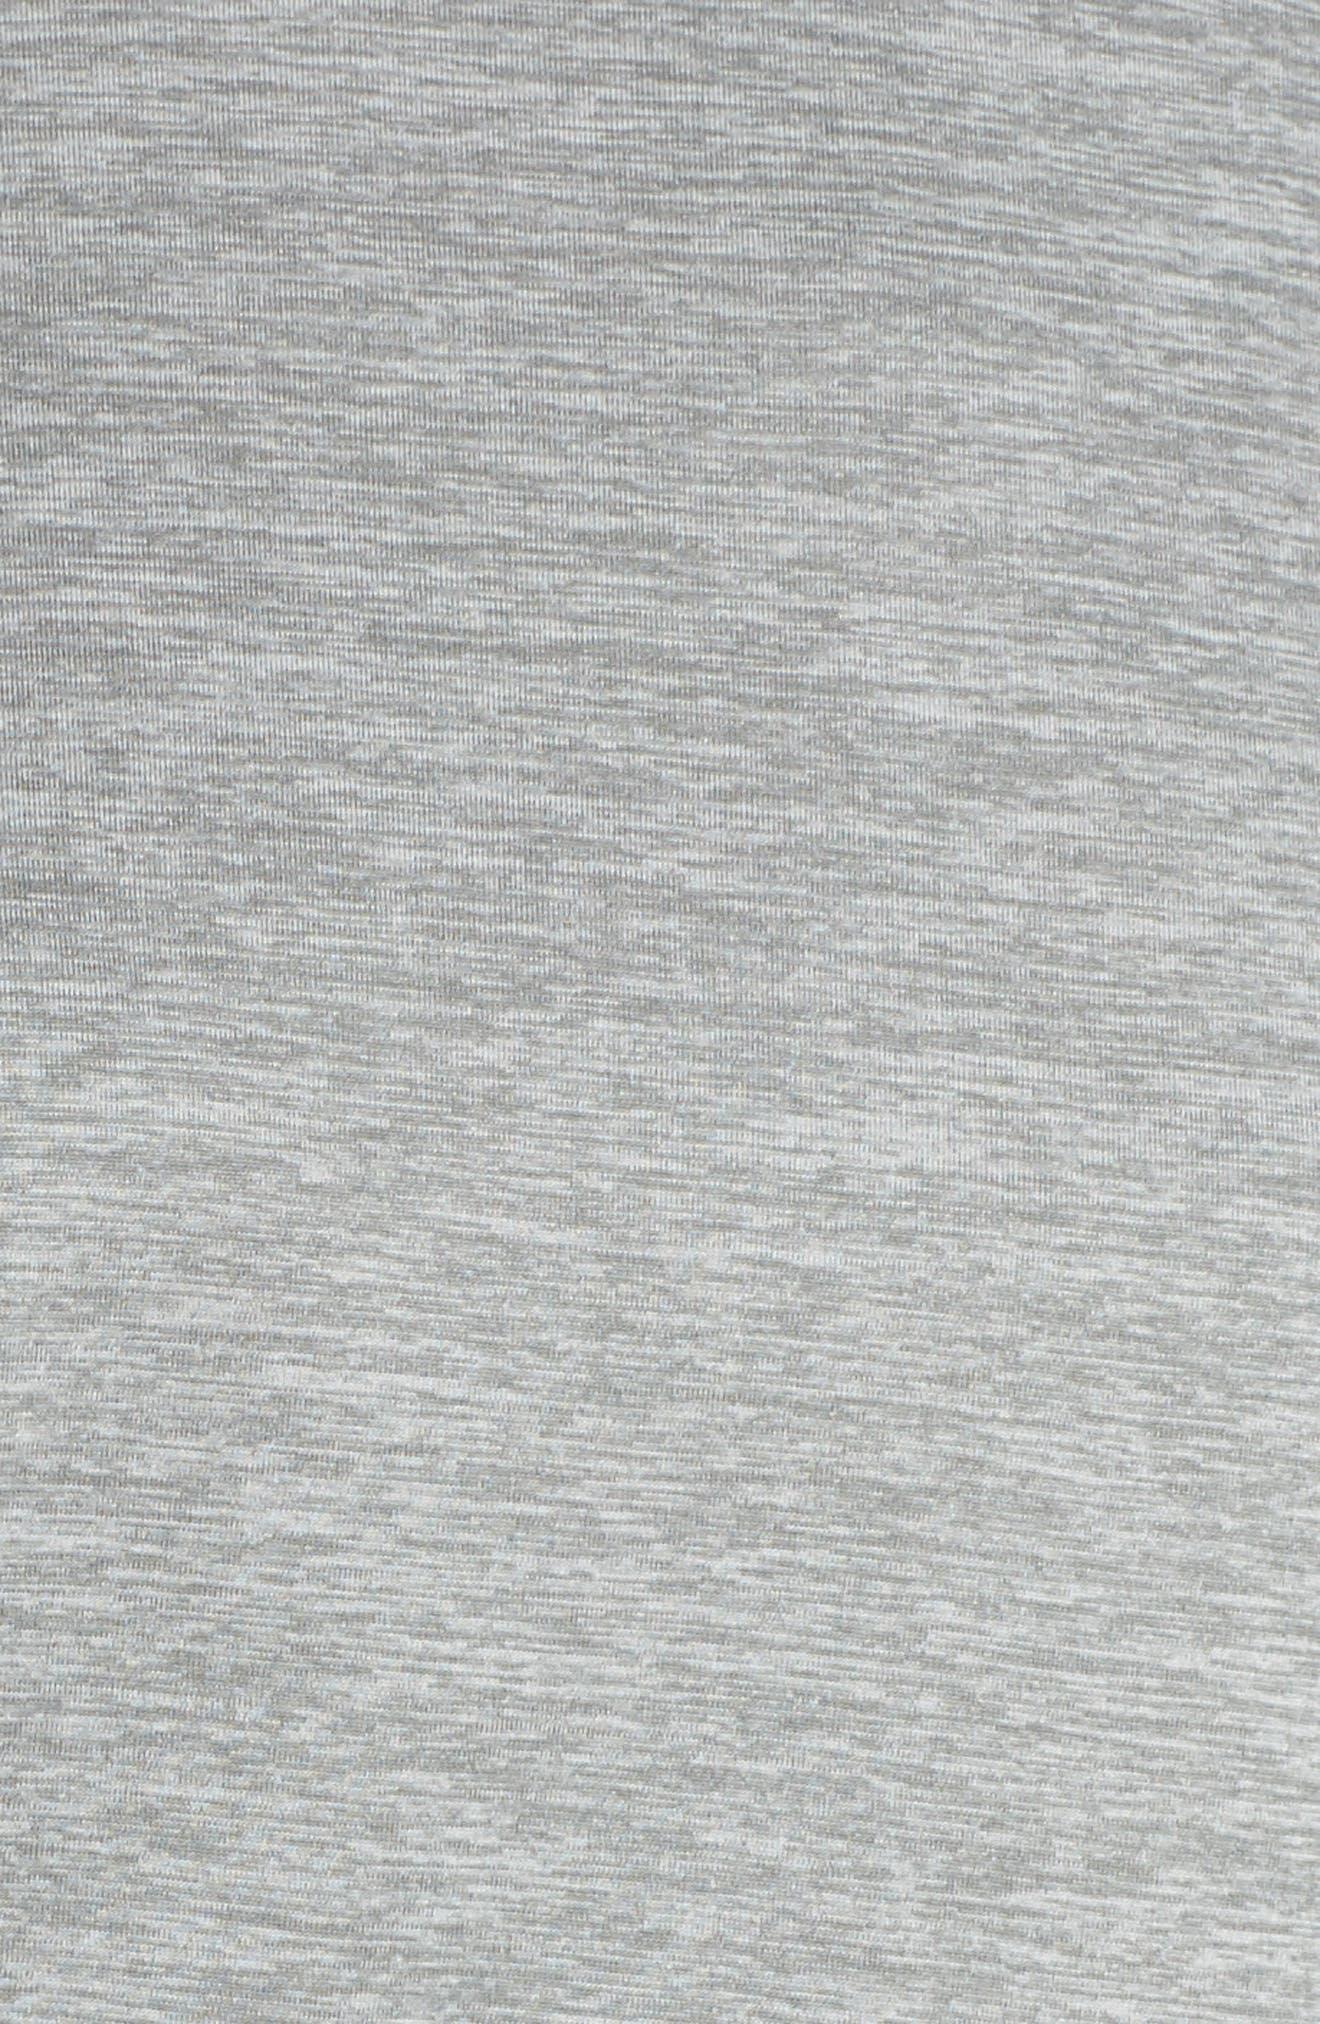 Capilene<sup>®</sup> Dailty T-Shirt,                             Alternate thumbnail 6, color,                             Feather Grey